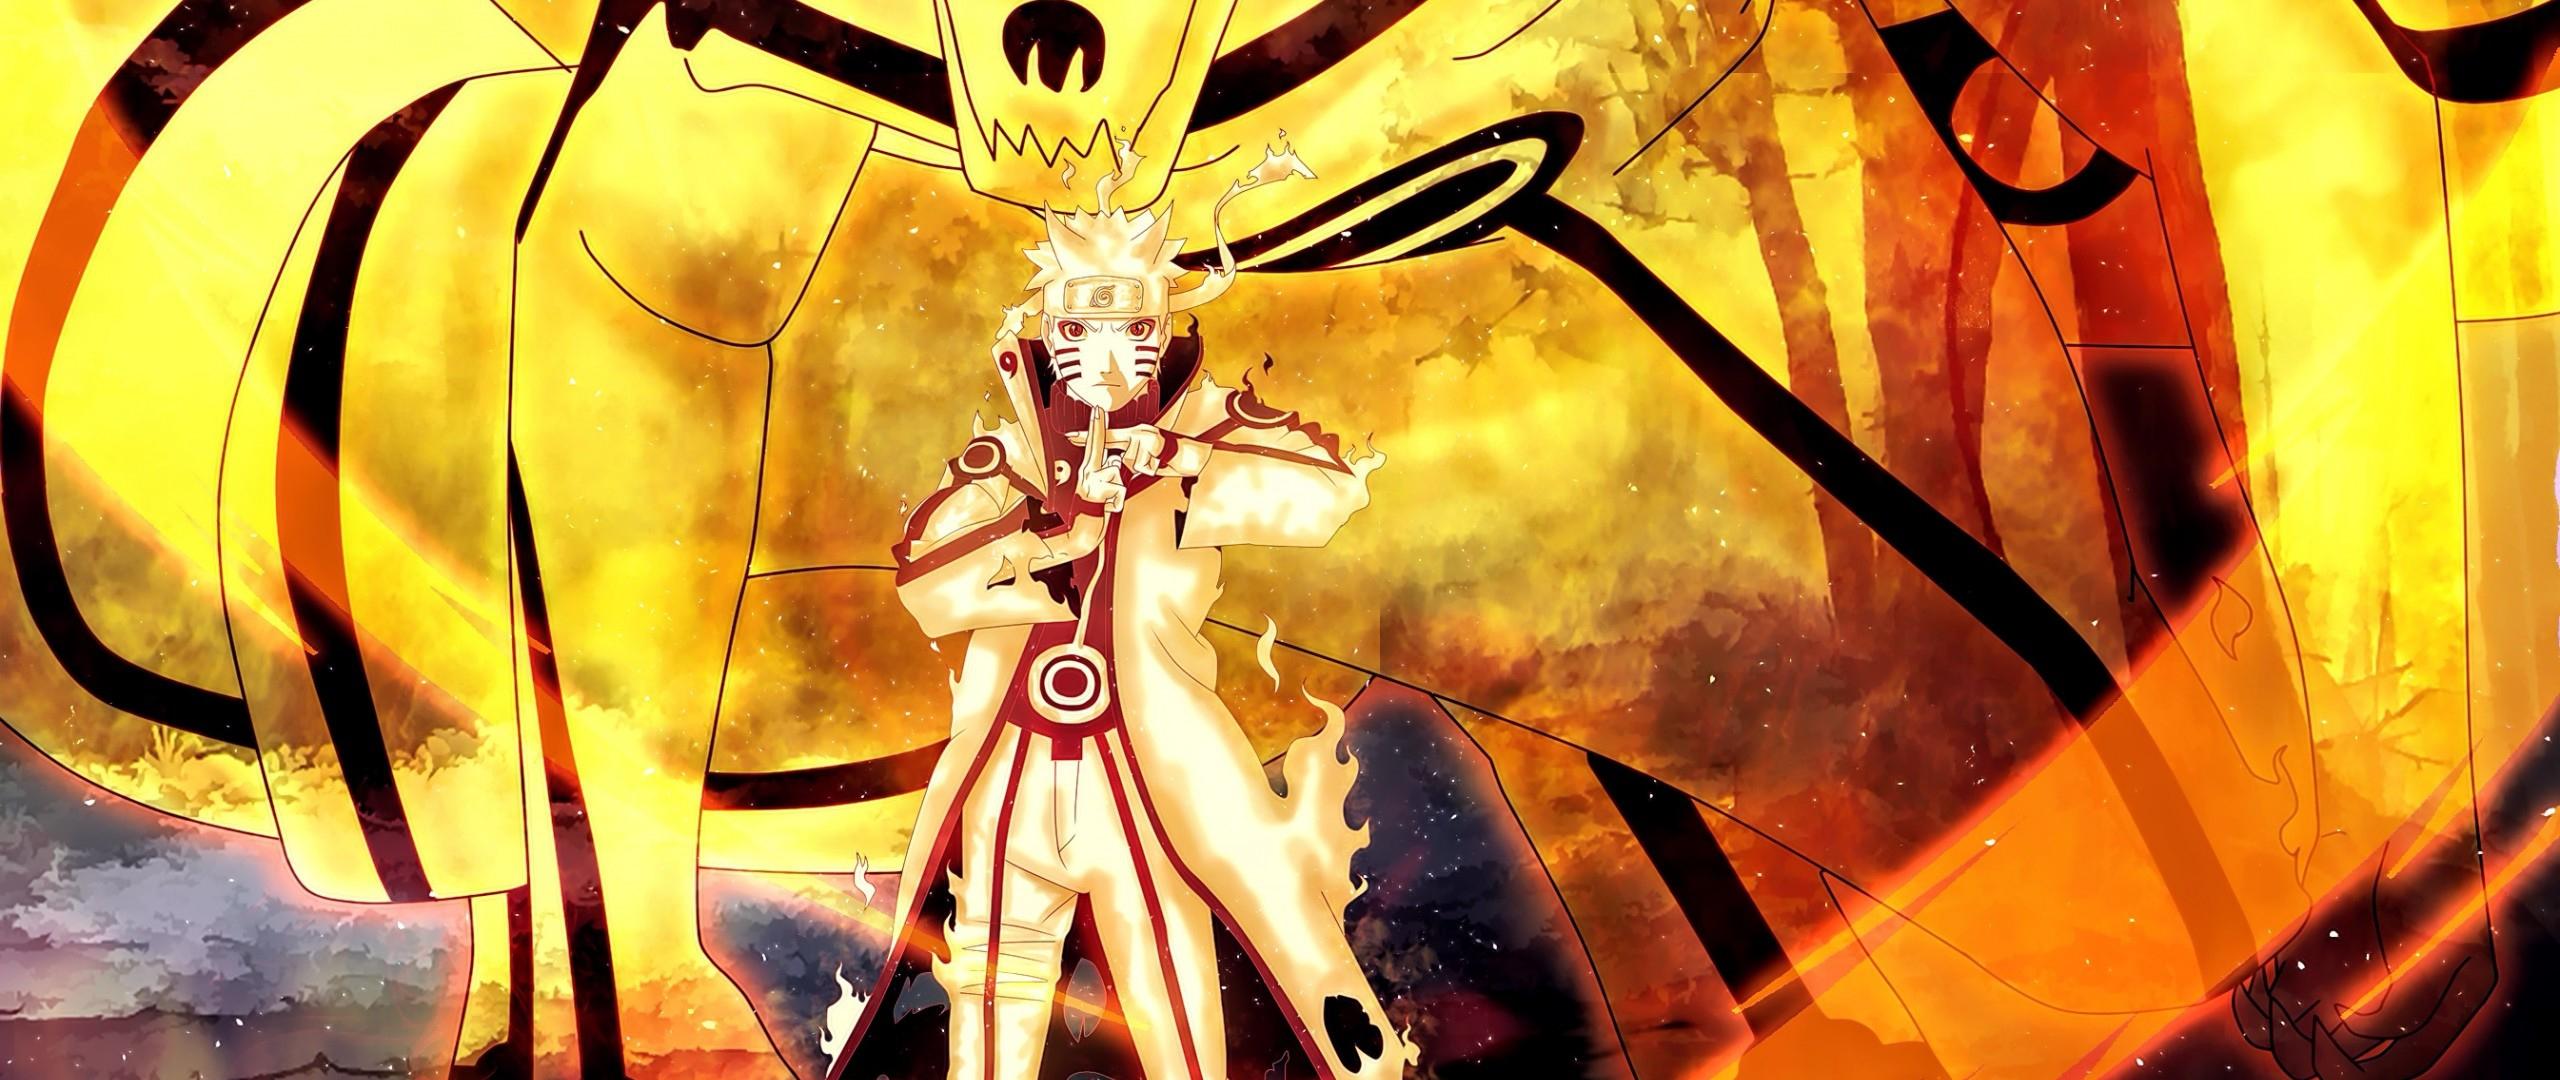 37+] 2560 x 1080 Anime Wallpaper on ...